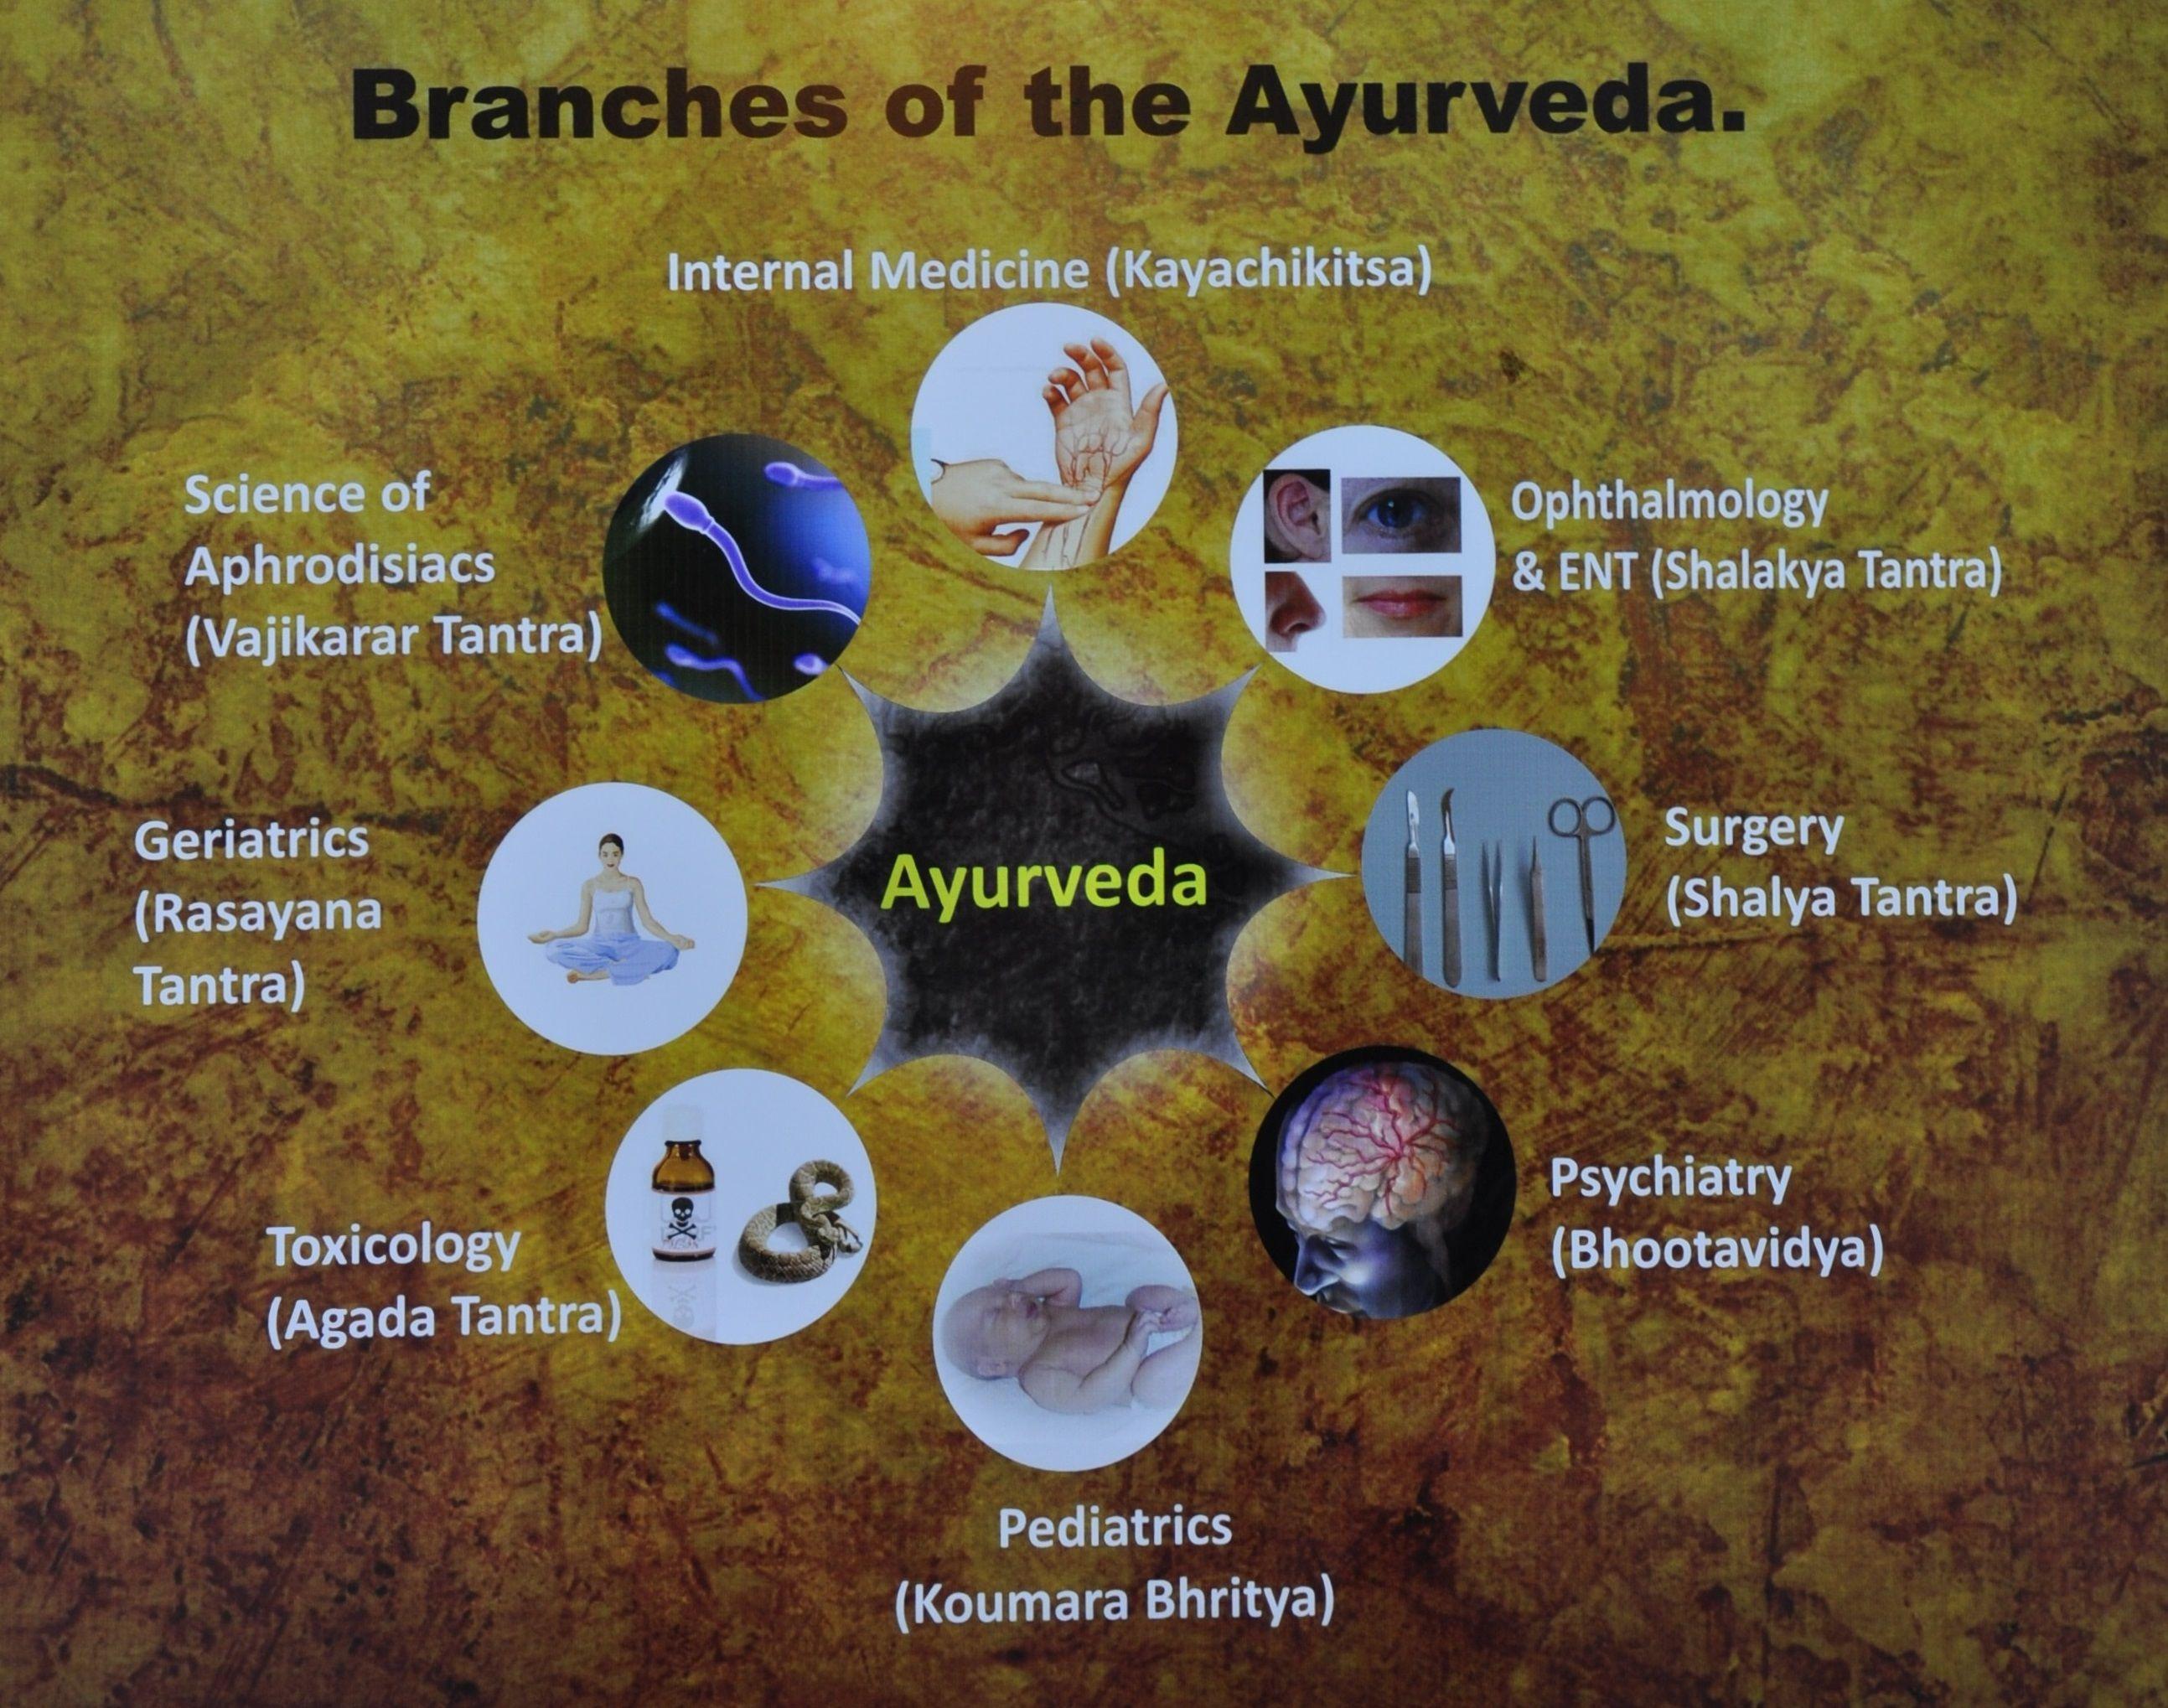 Rasayana Tantra, Branch of Ayurveda medicine